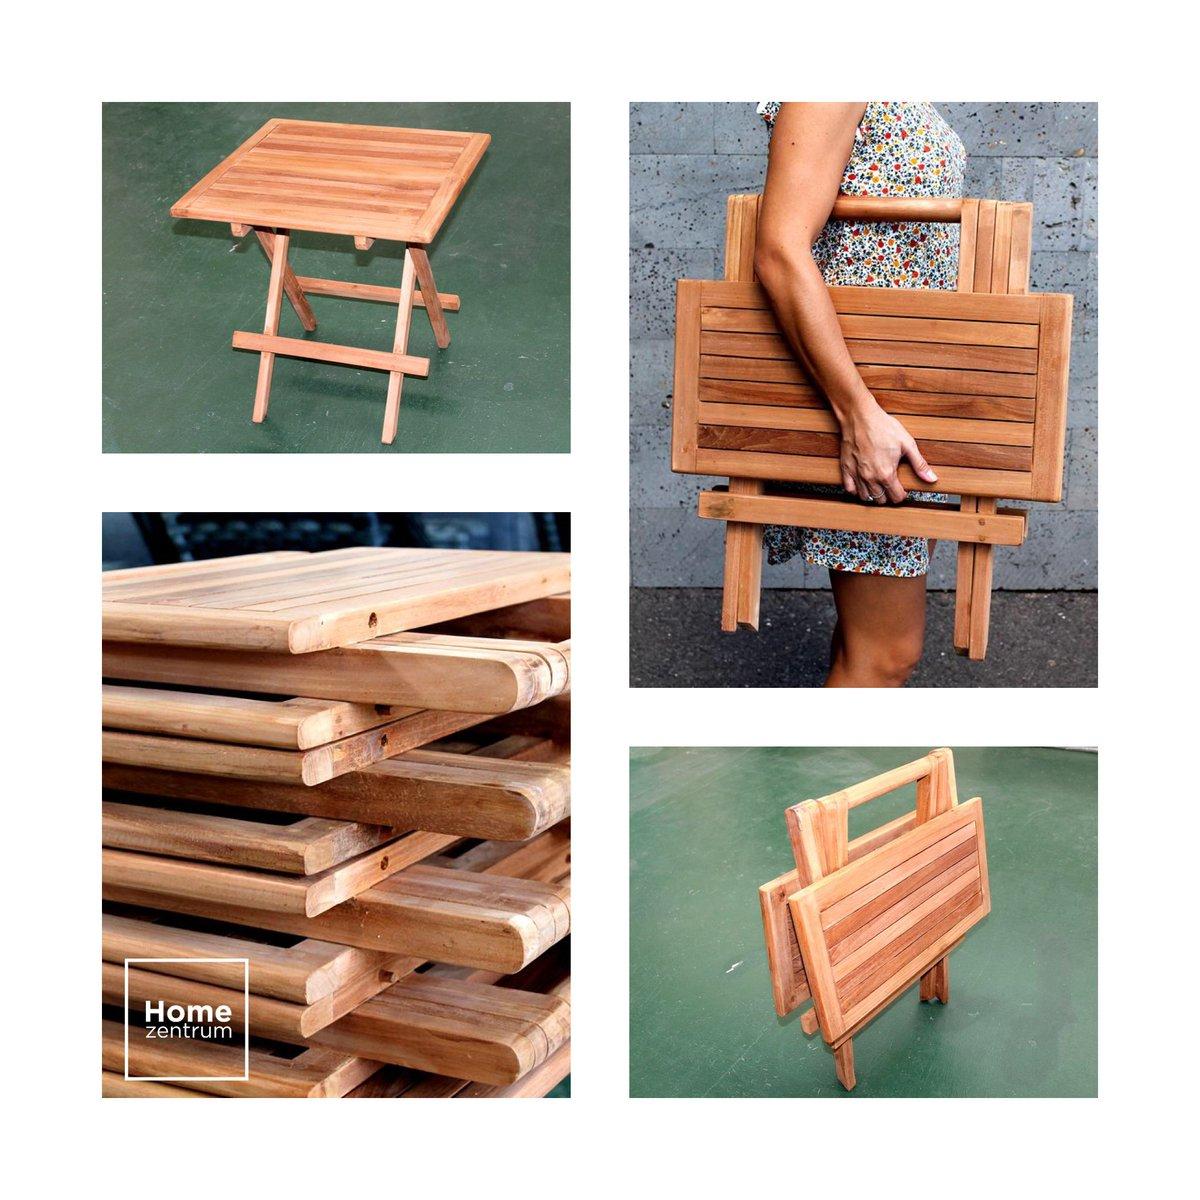 ¿A handbag or a table? Folding teak table, to take it wherever you go.  http:// bit.ly/2z8P35W  &nbsp;    #interiorismo #designdeinteriores #picnic<br>http://pic.twitter.com/Kl1uYlebi2